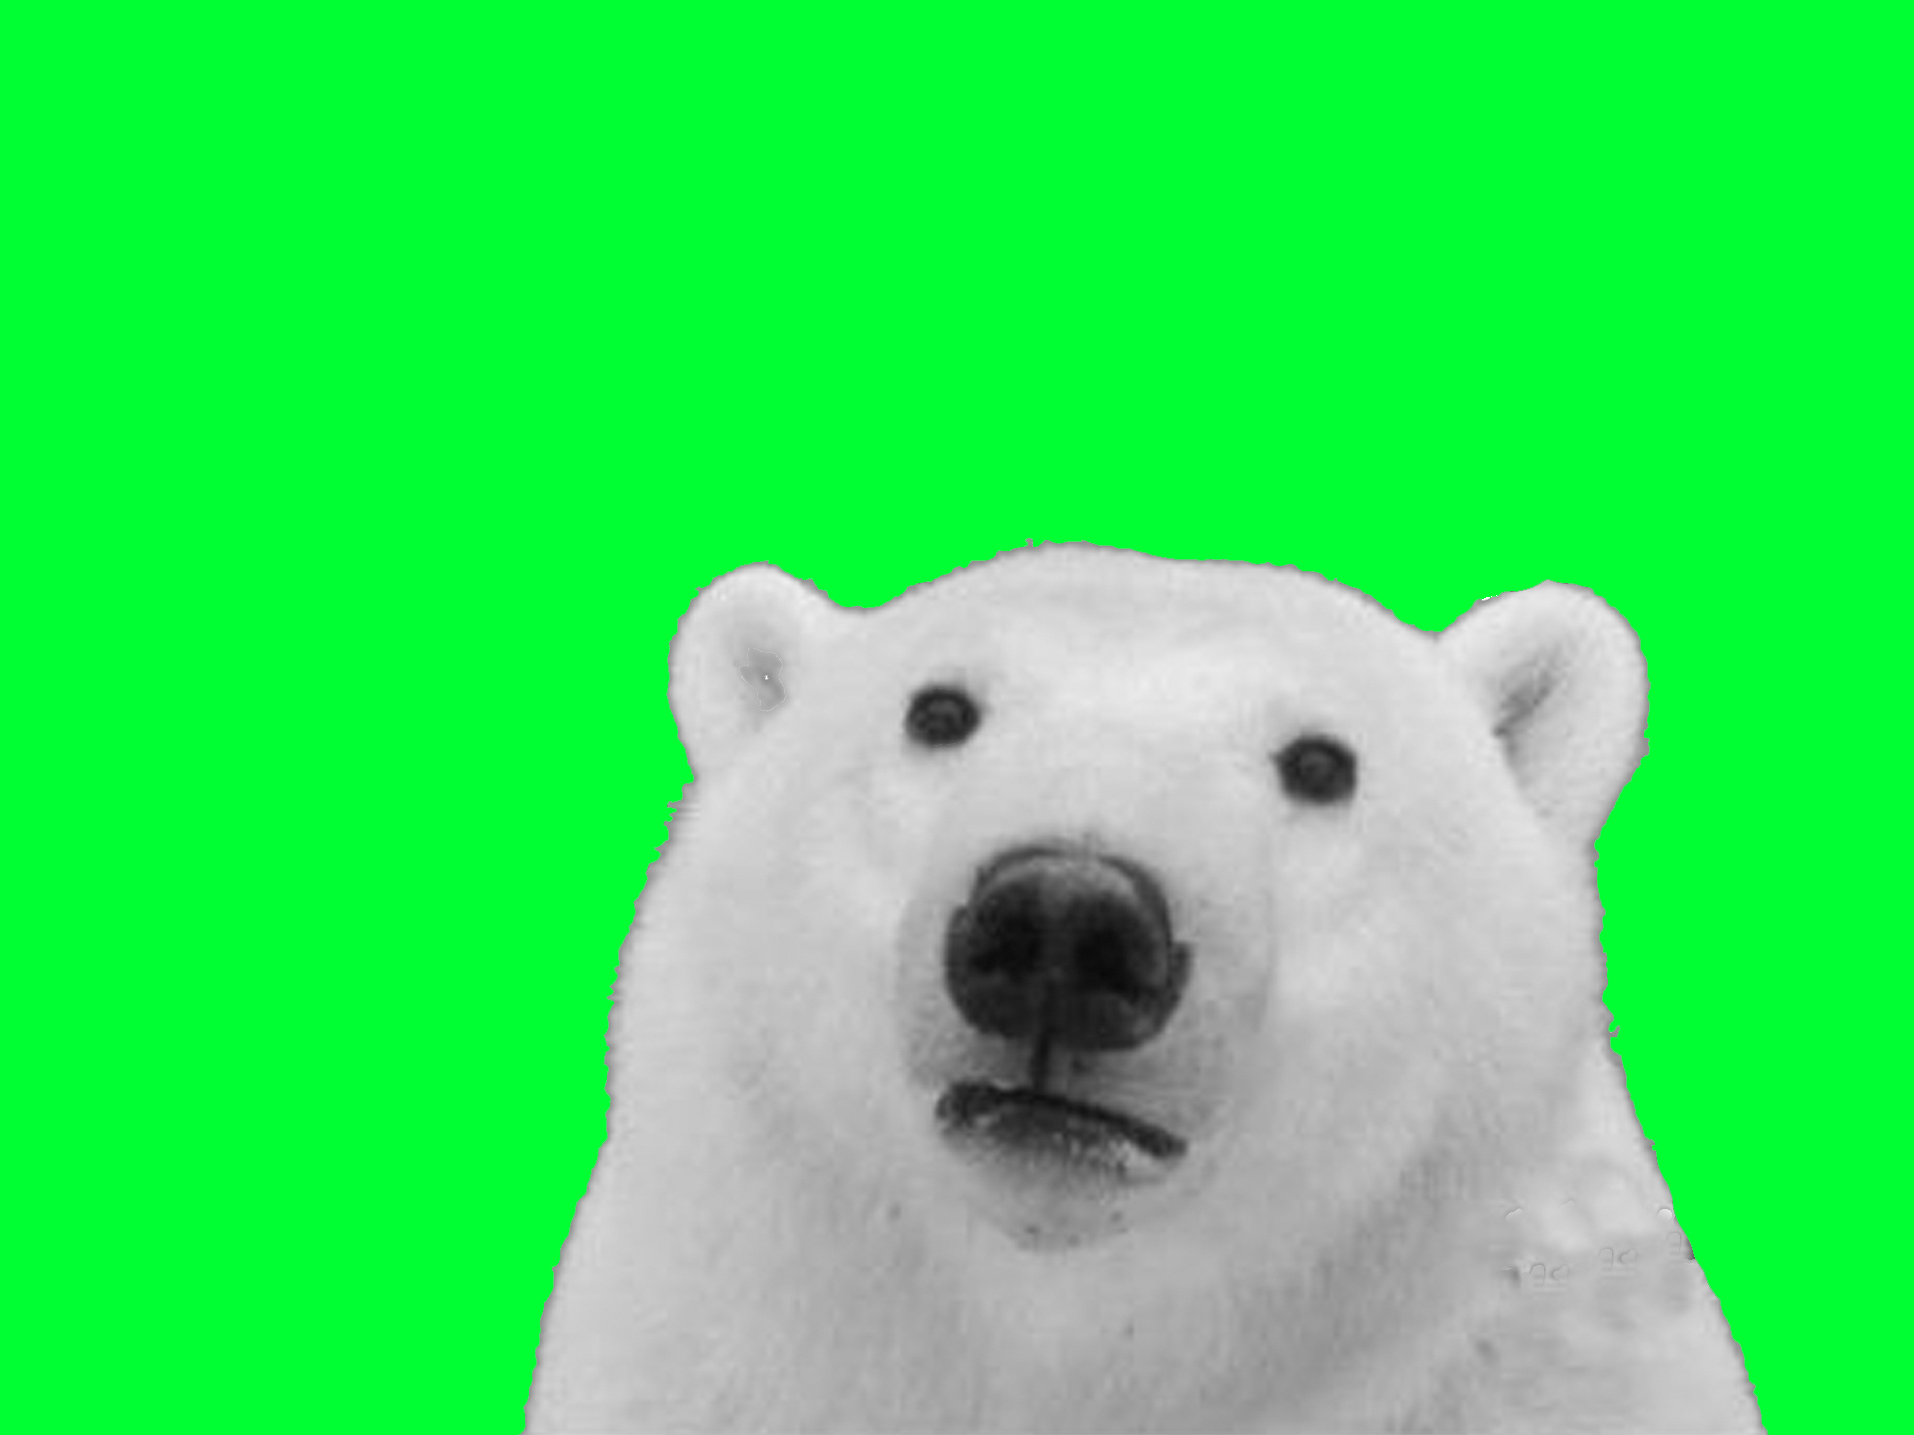 Green Screen Polar Bear   Know Your Meme